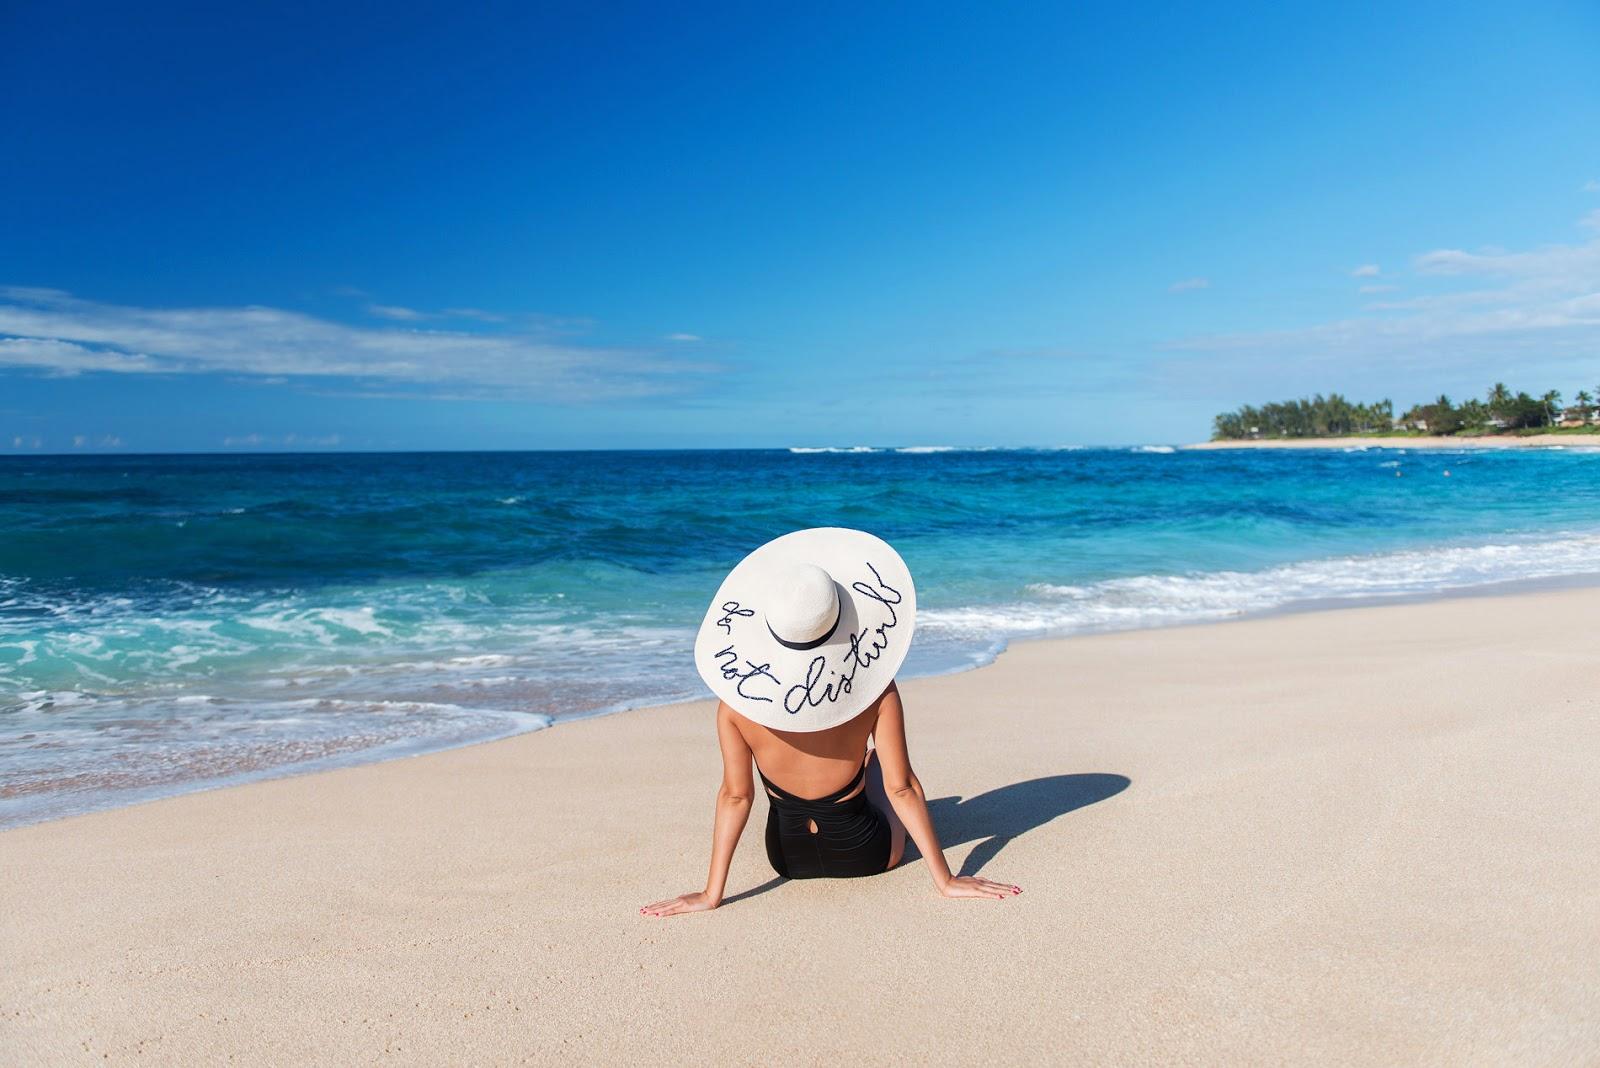 sun hat at beach